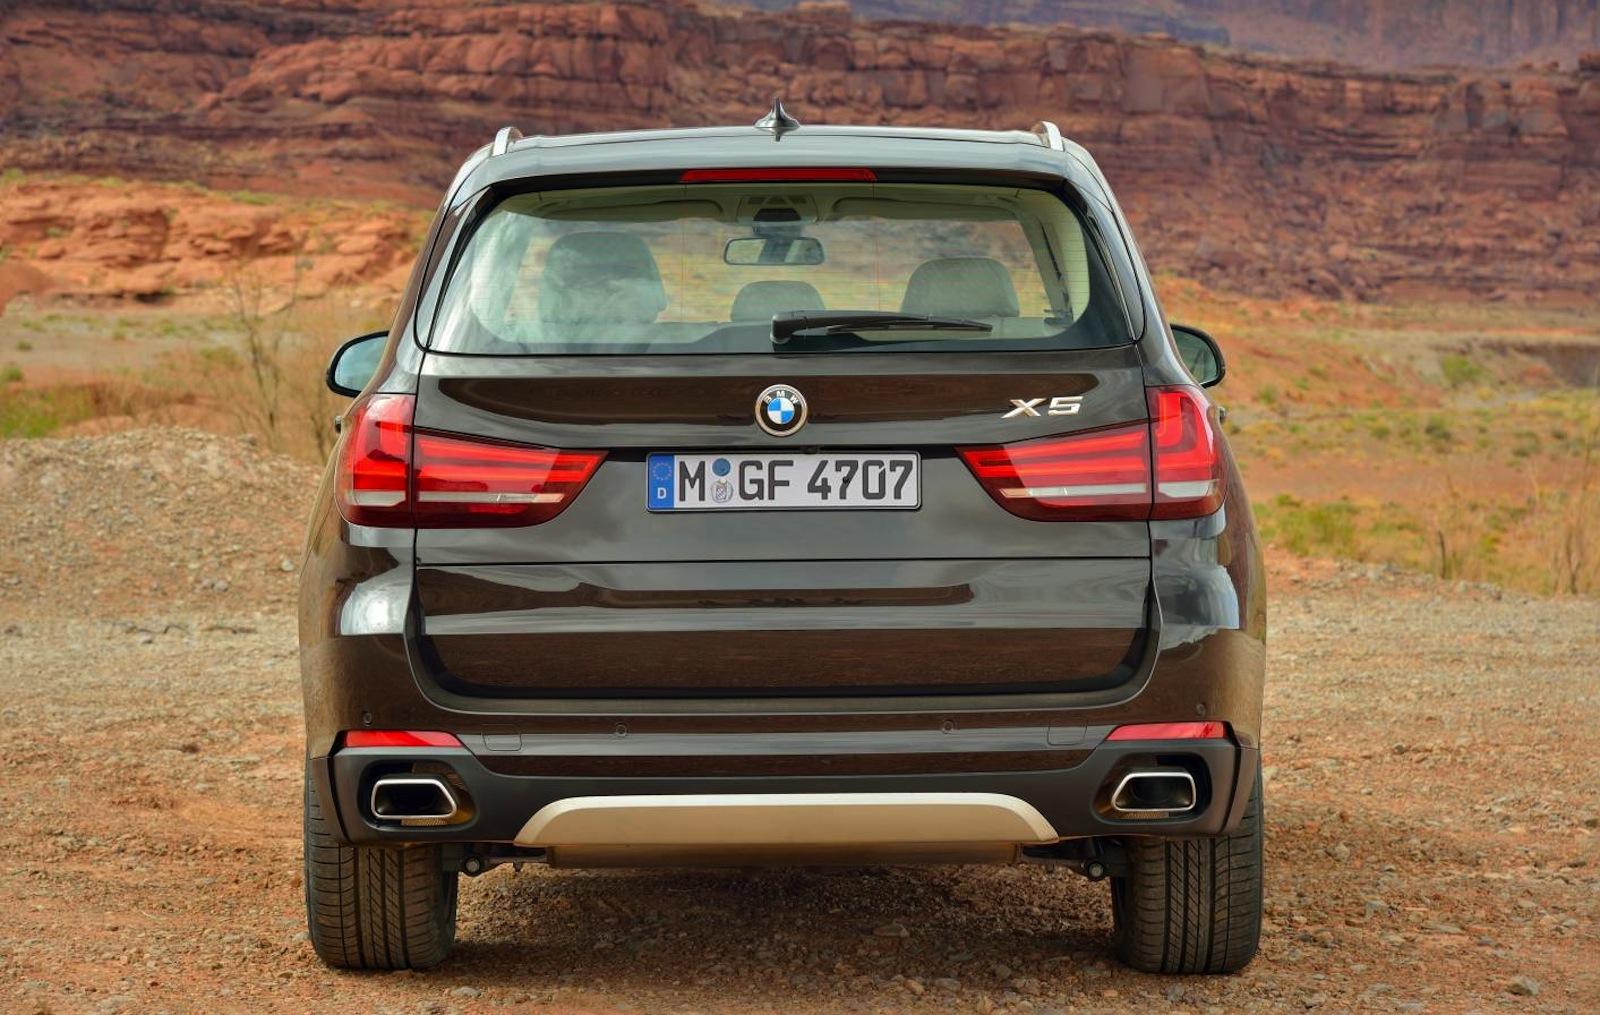 Bmw X5 Rear Wheel Drive For Third Gen Luxury Suv Photos